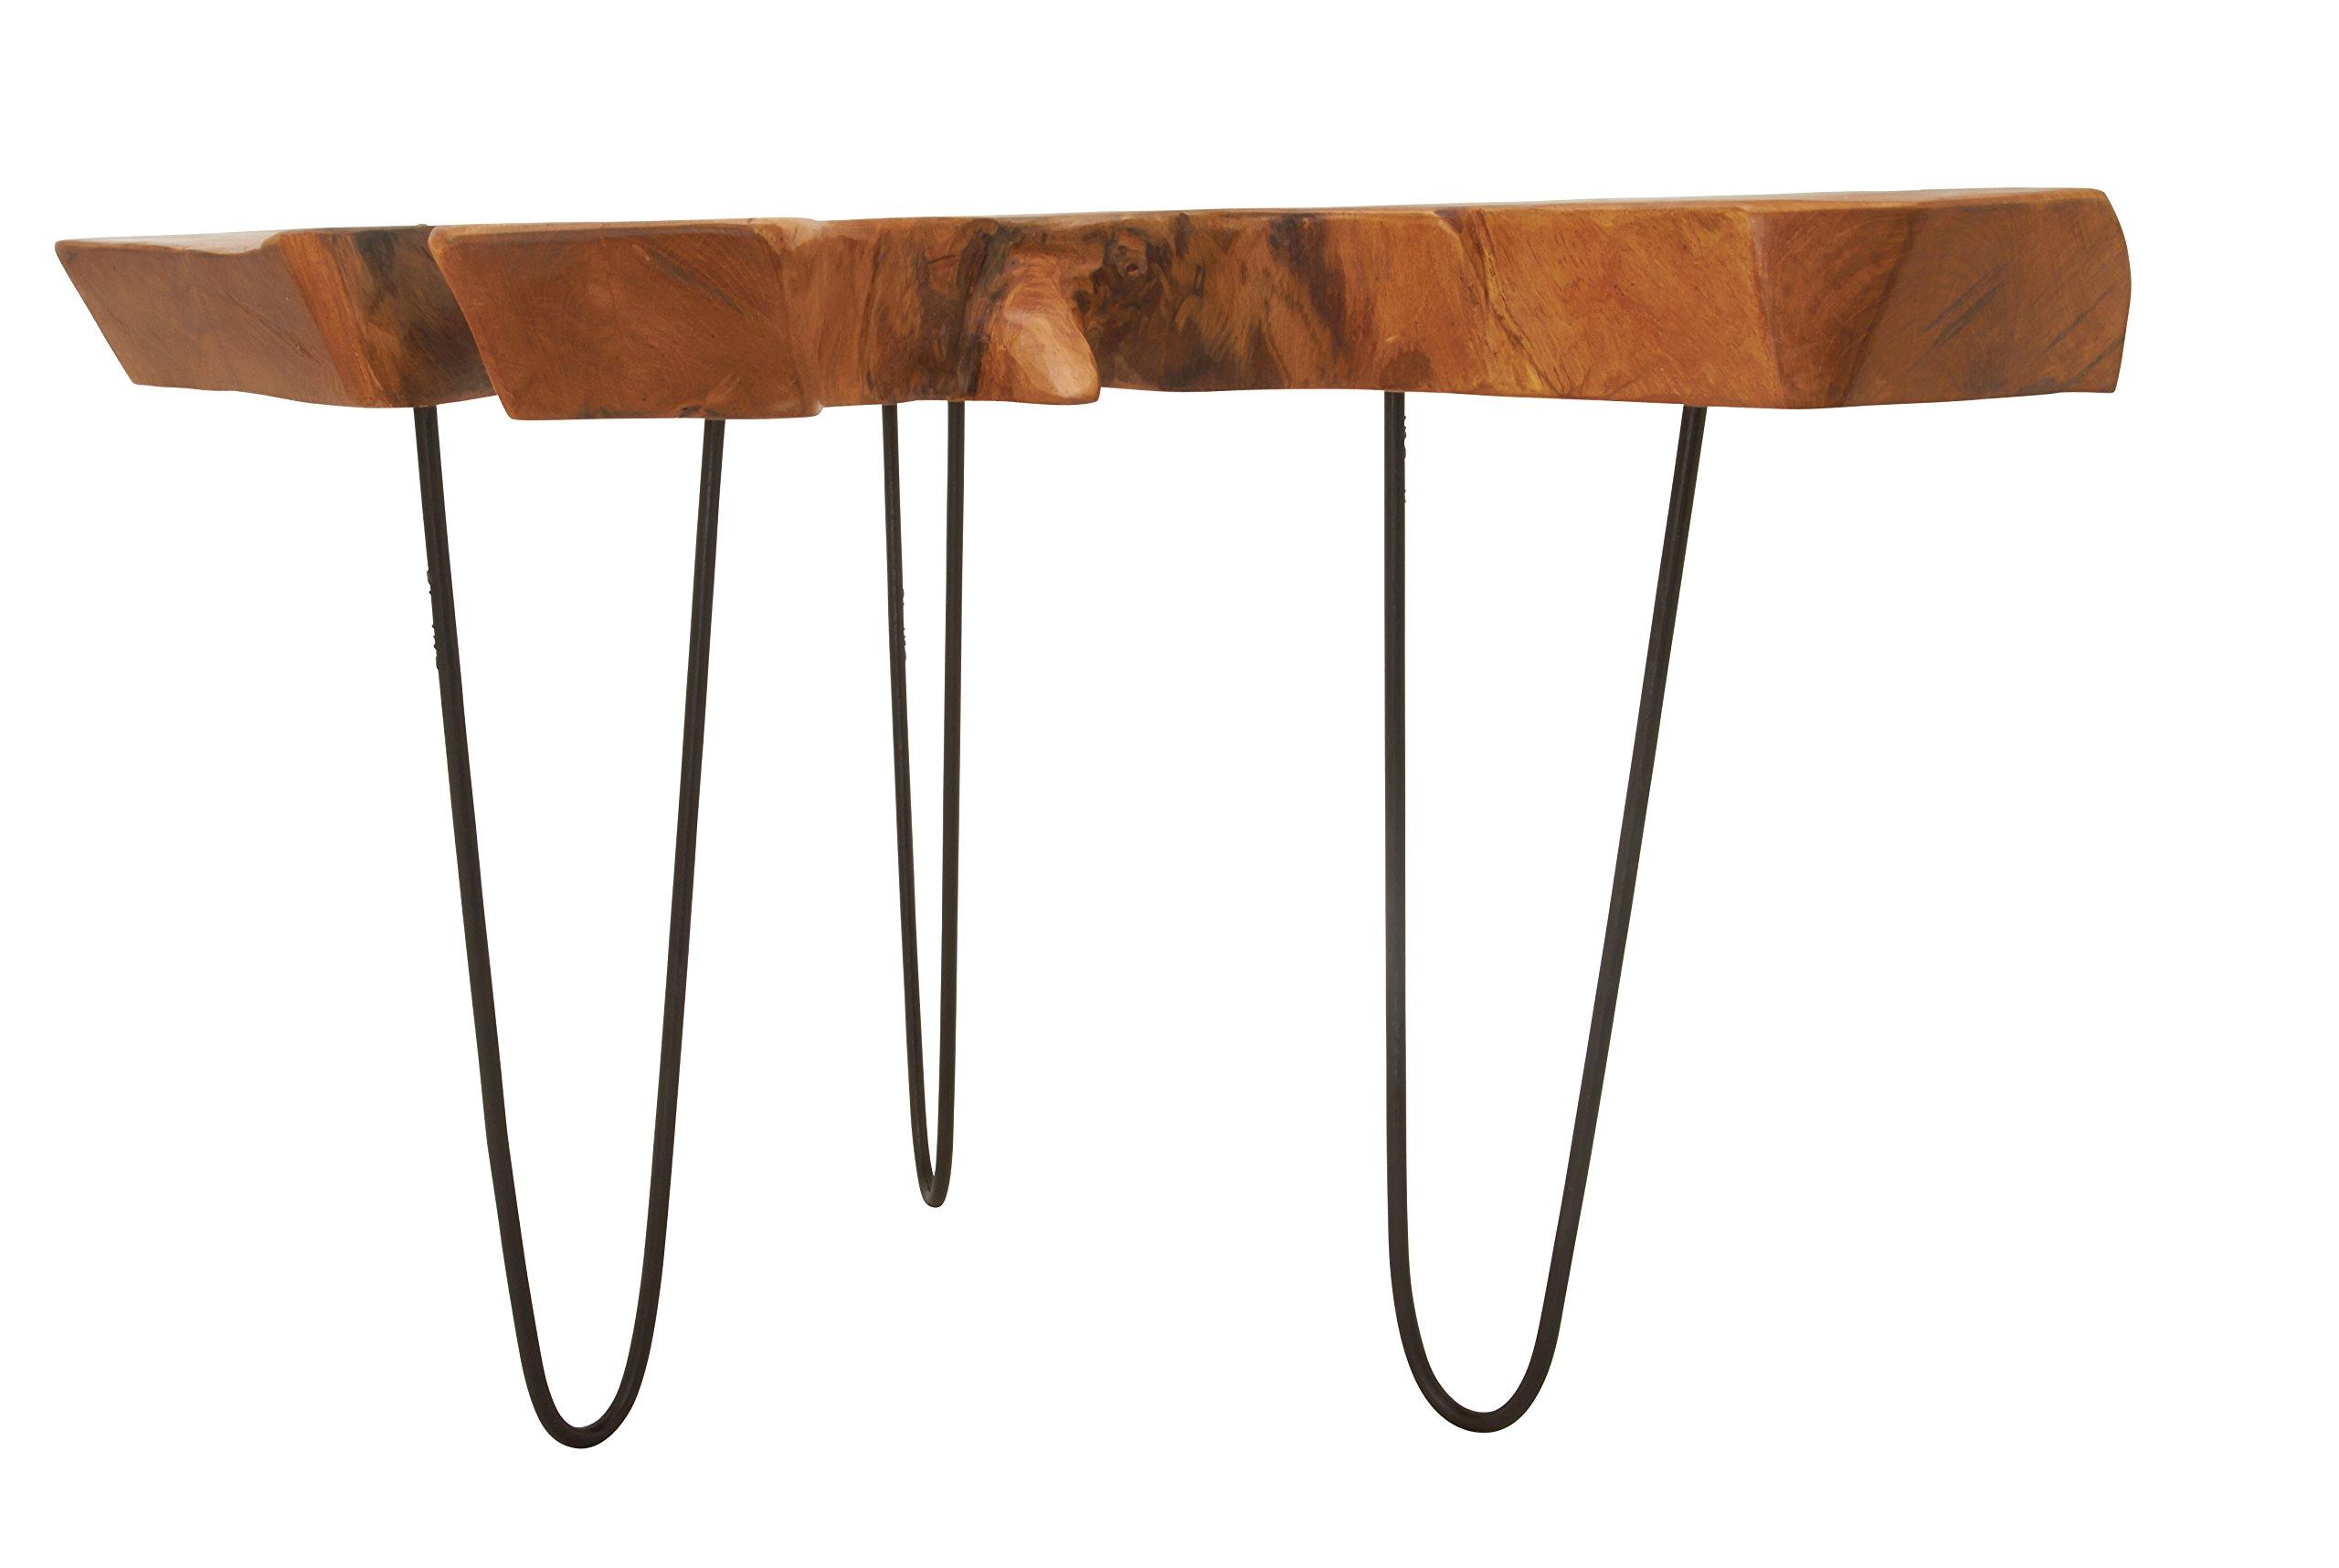 Deco 79 39181 Teak Wood Metal Accent Table, 32'' x 19''